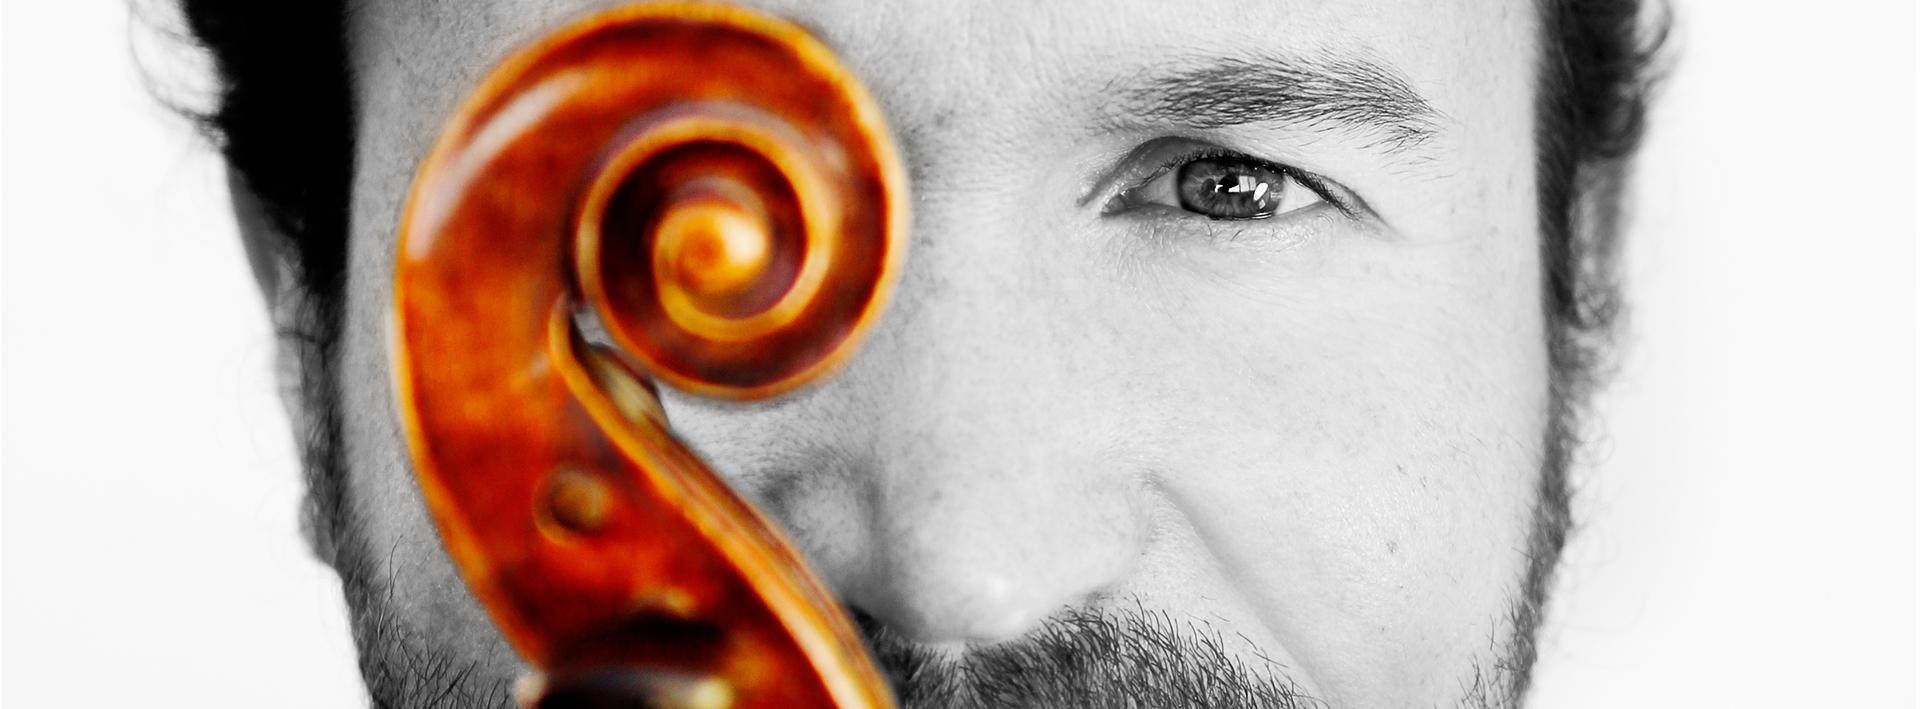 Compositor-ukelele-y-creador-musical